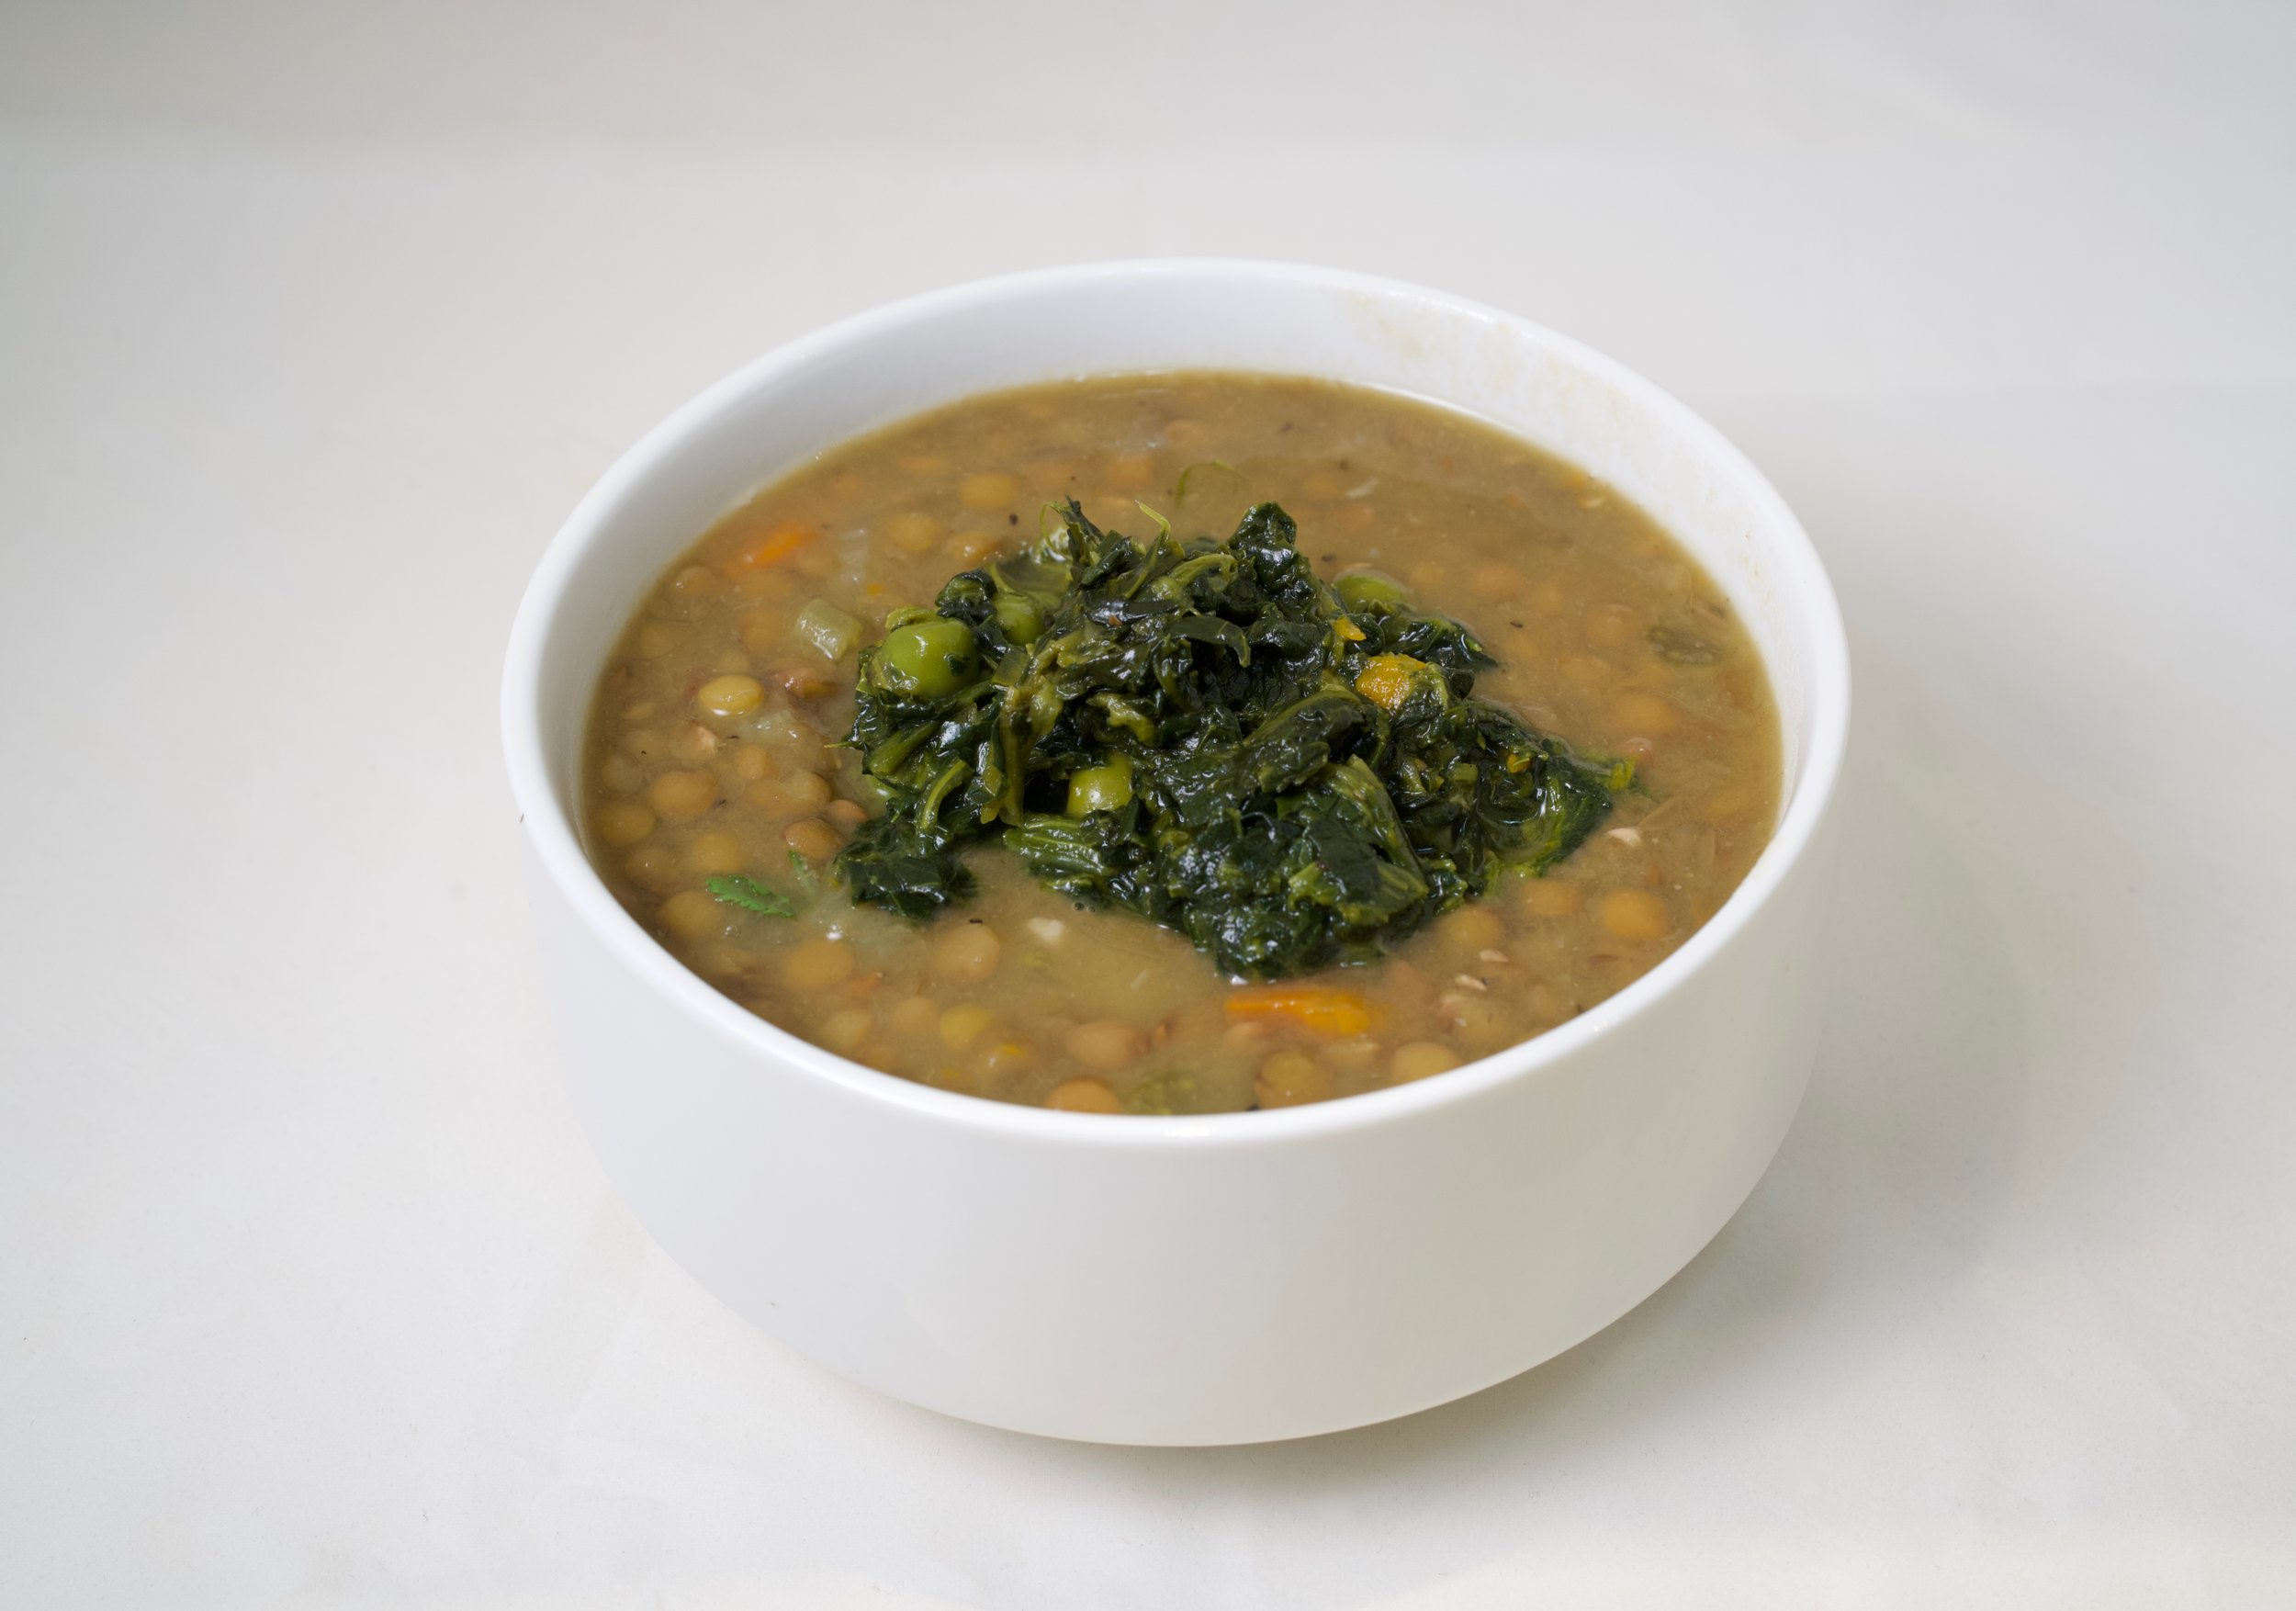 70. Spinach Lentil